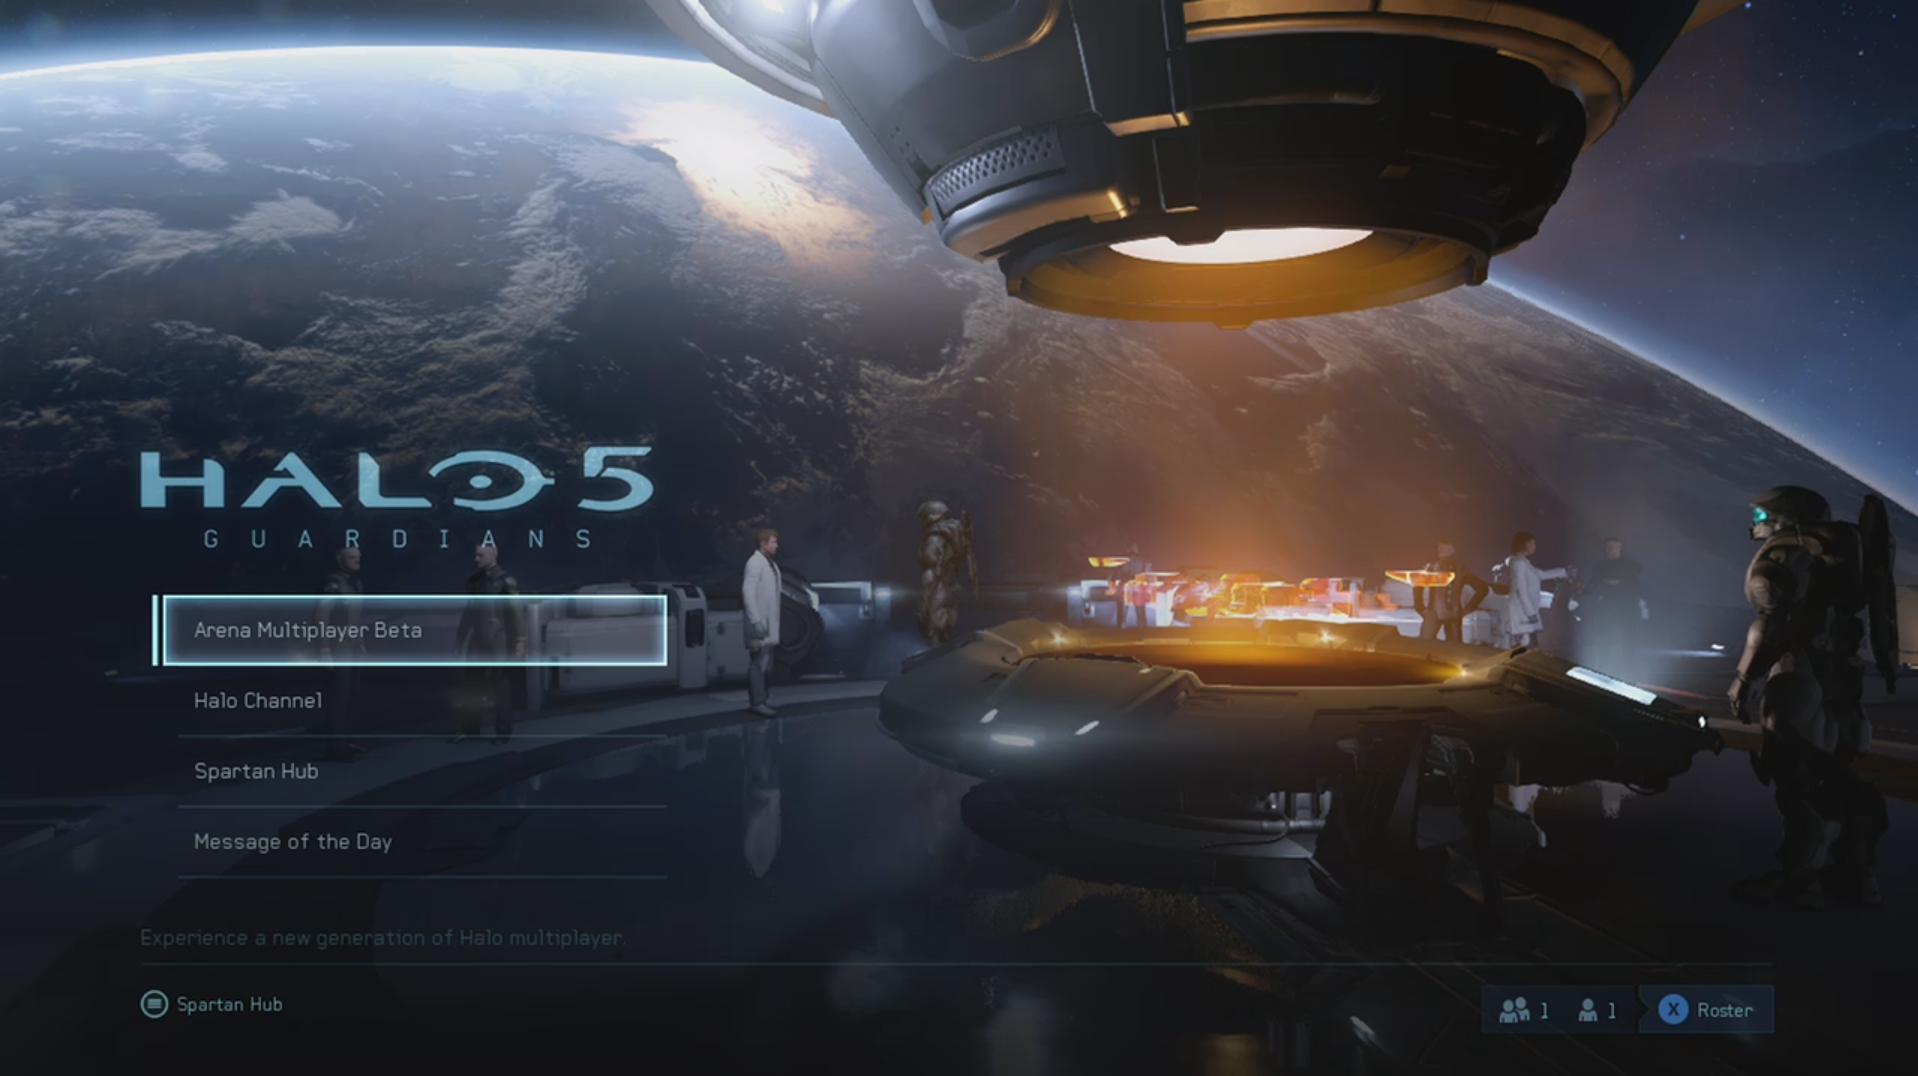 Halo 5 Guardians Main Screen